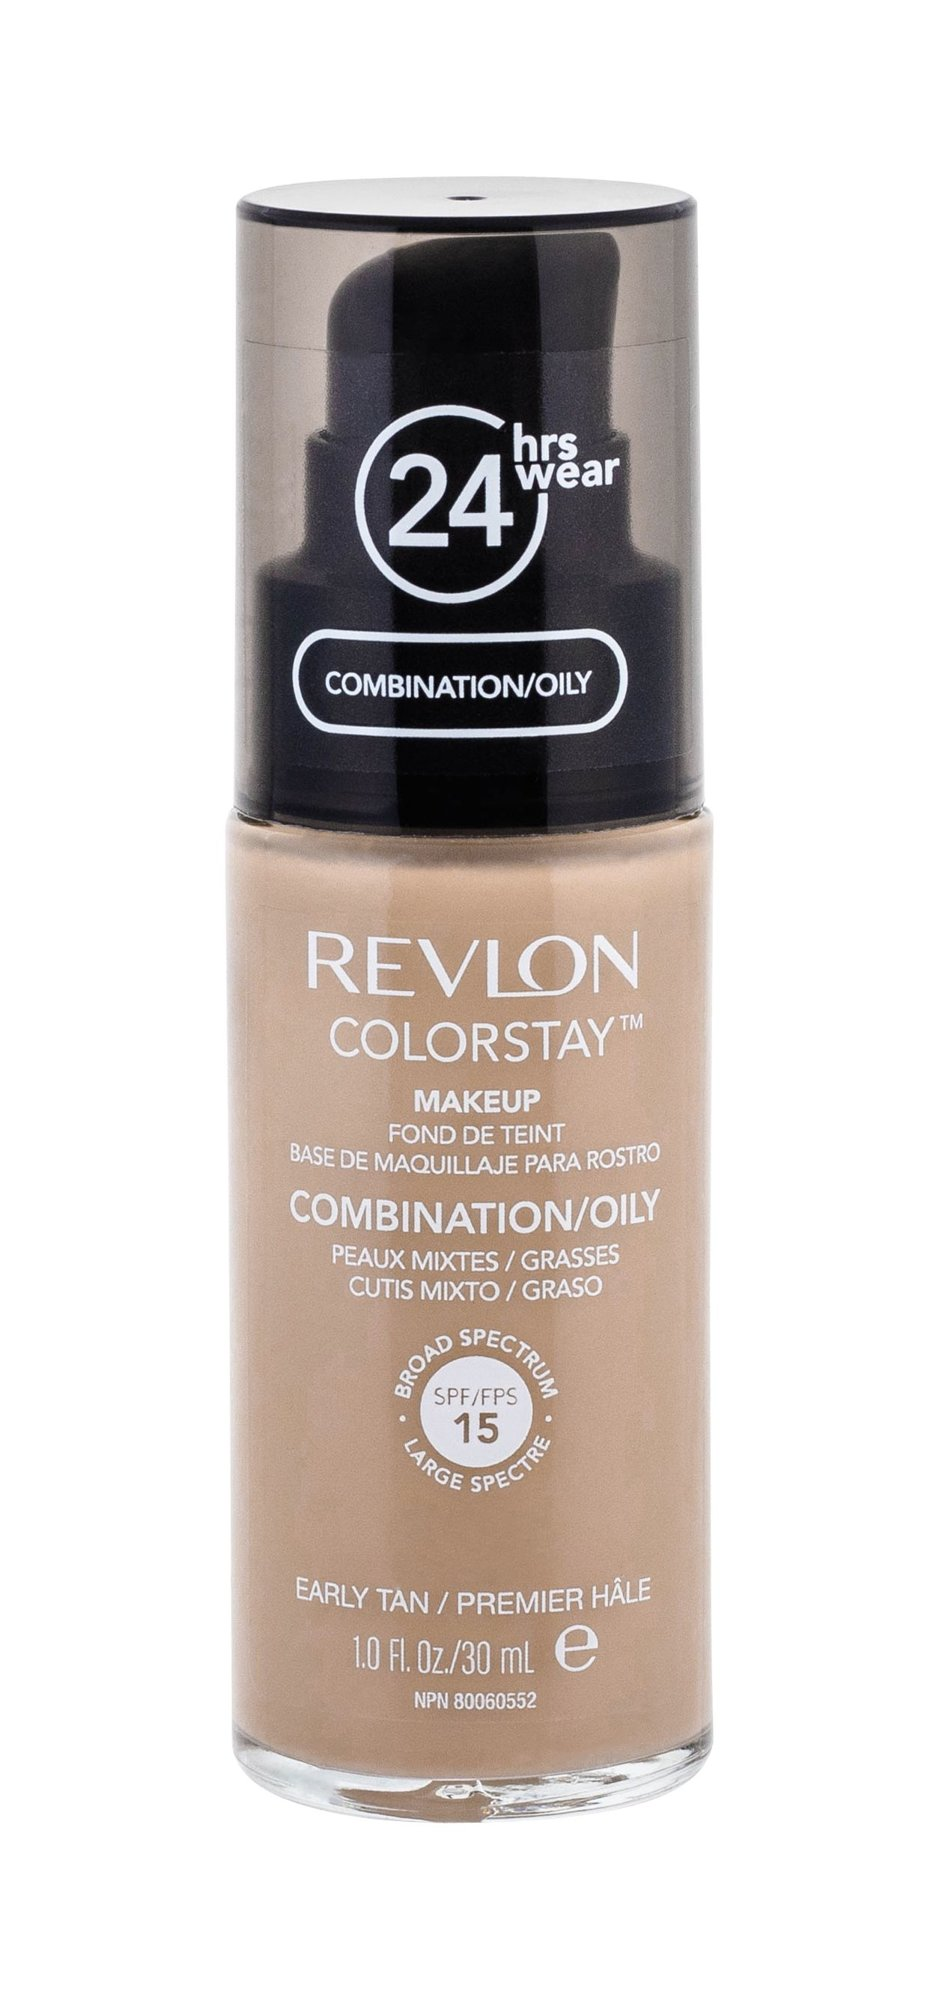 Revlon Colorstay Cosmetic 30ml 150 Buff Chamois